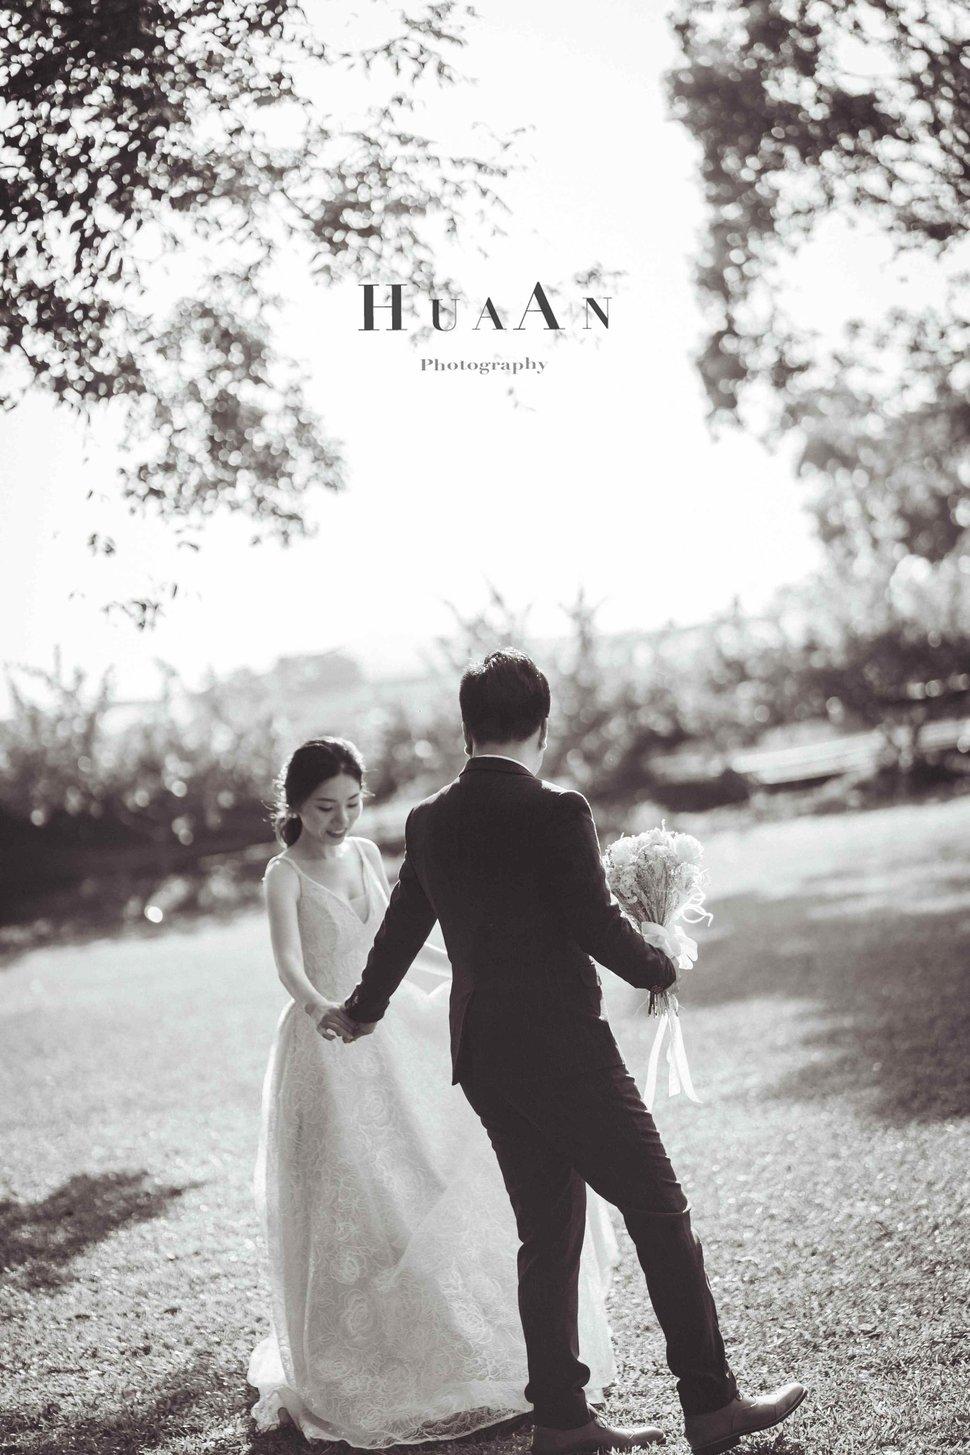 DSC04869 - Huaan Photography《結婚吧》